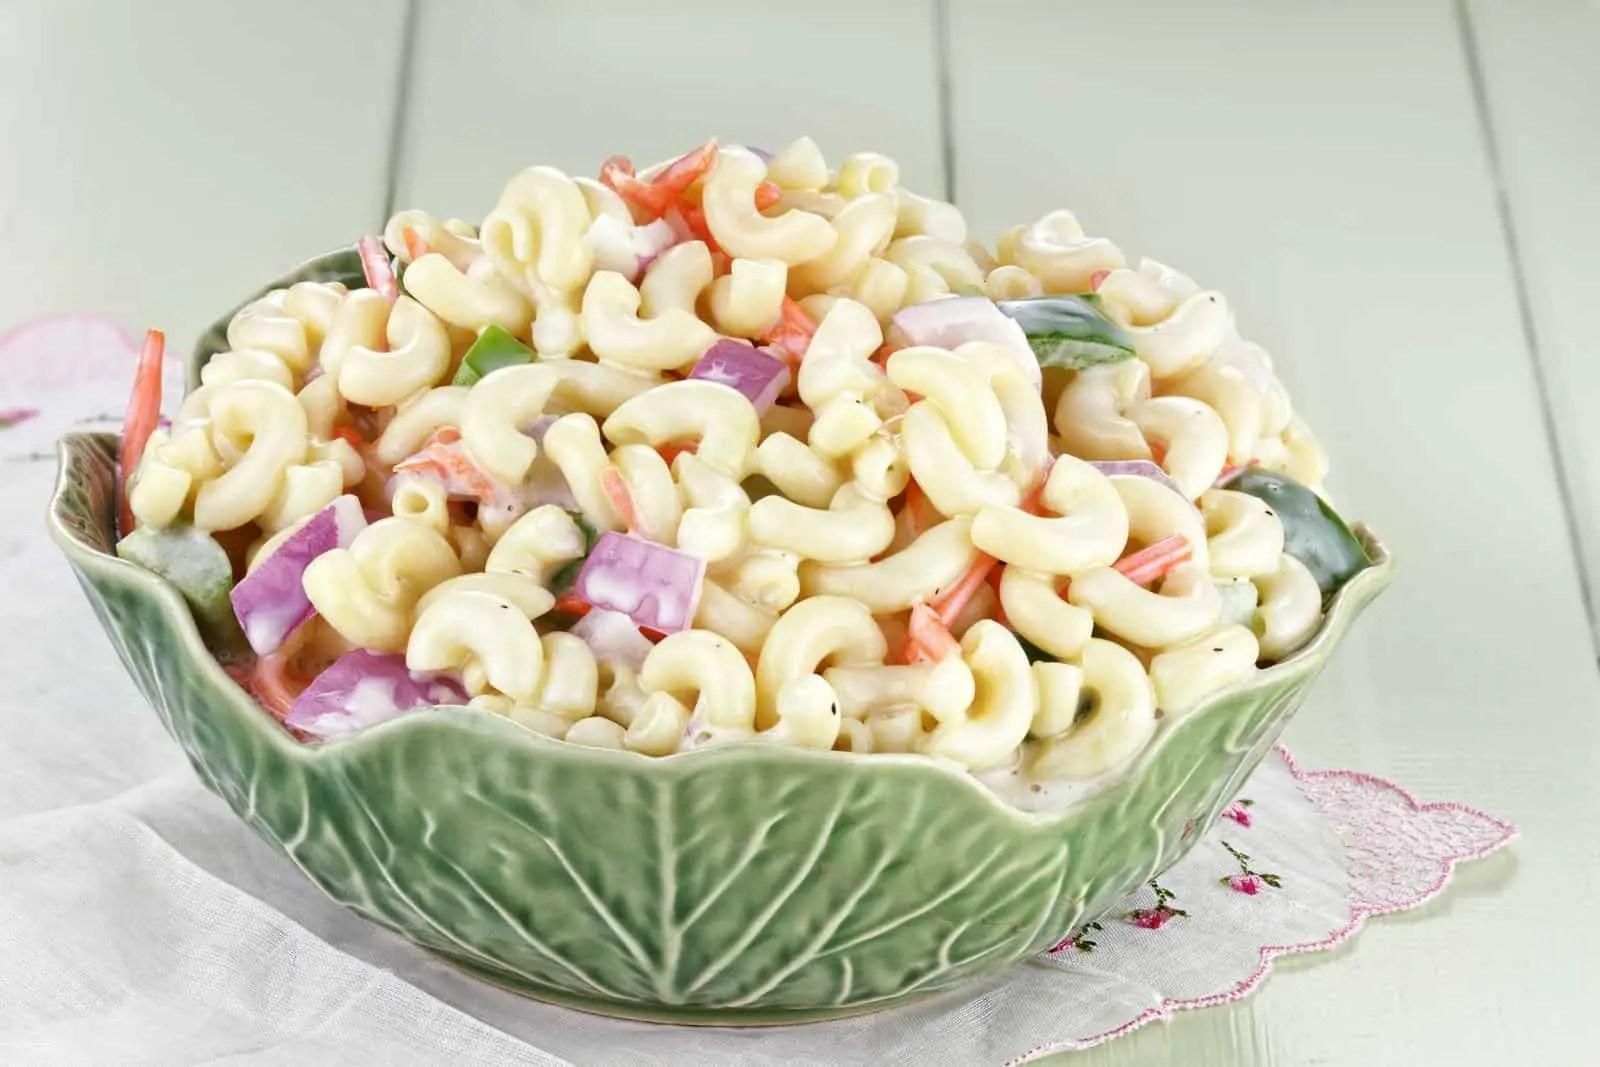 Can You Freeze Macaroni Salad?